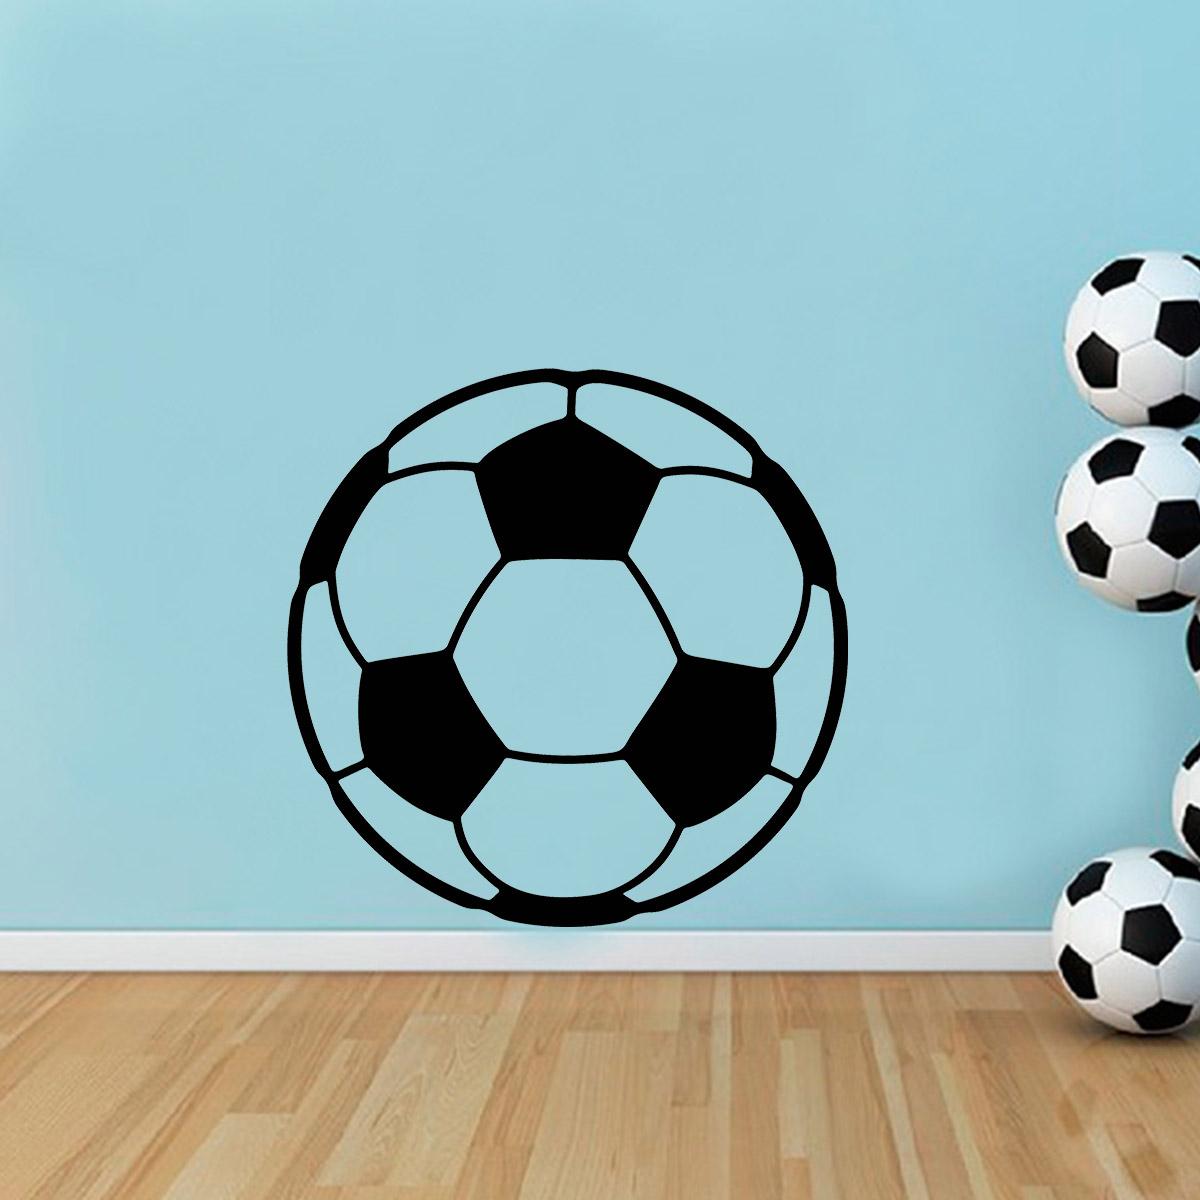 Adesivo de Parede Esporte Bola de Futebol f32b9826ba338